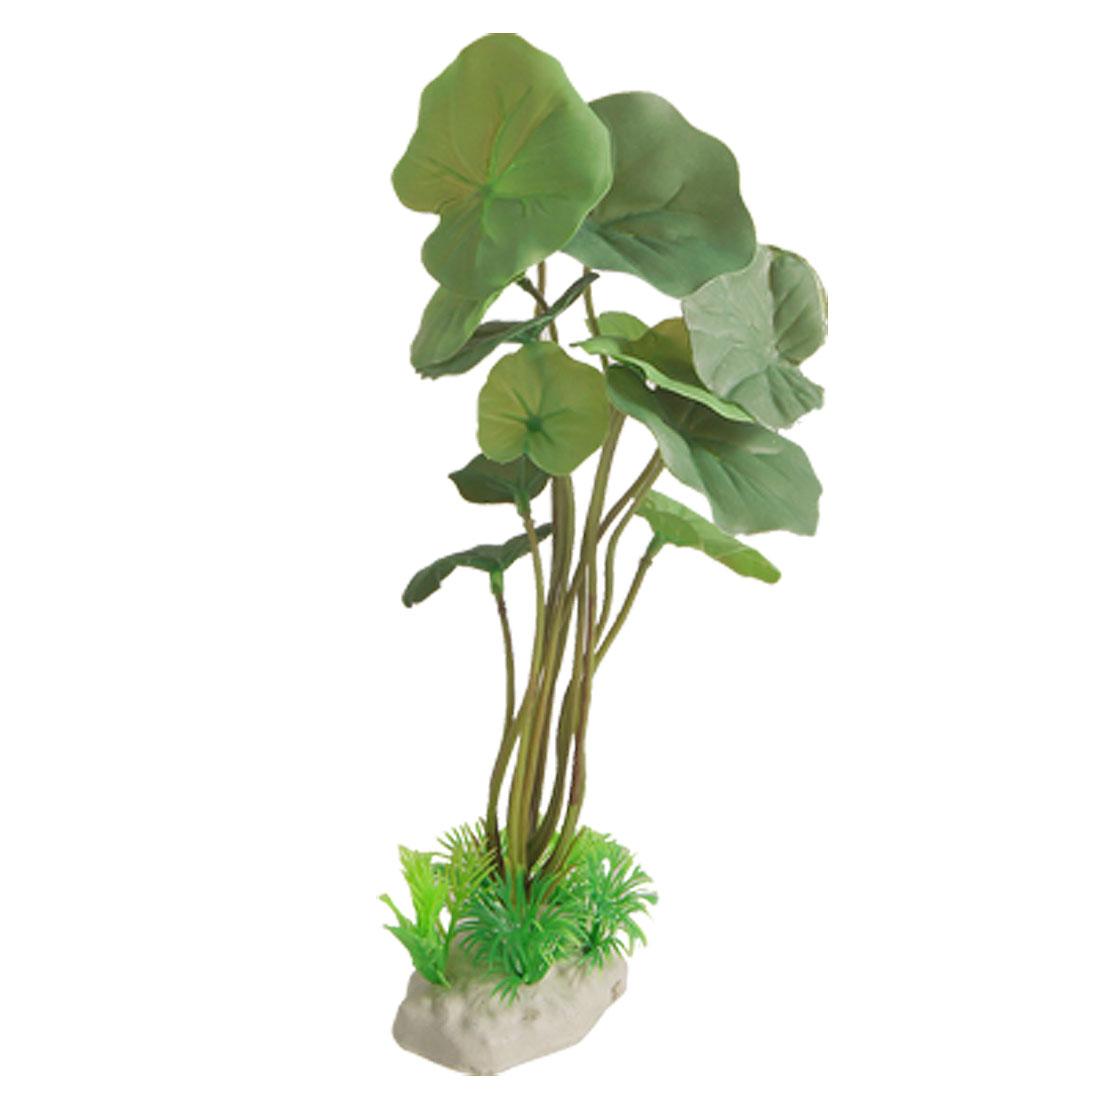 "Round Leaves 10"" High Plastic Plant Ornament Green for Fish Tank Aquarium"